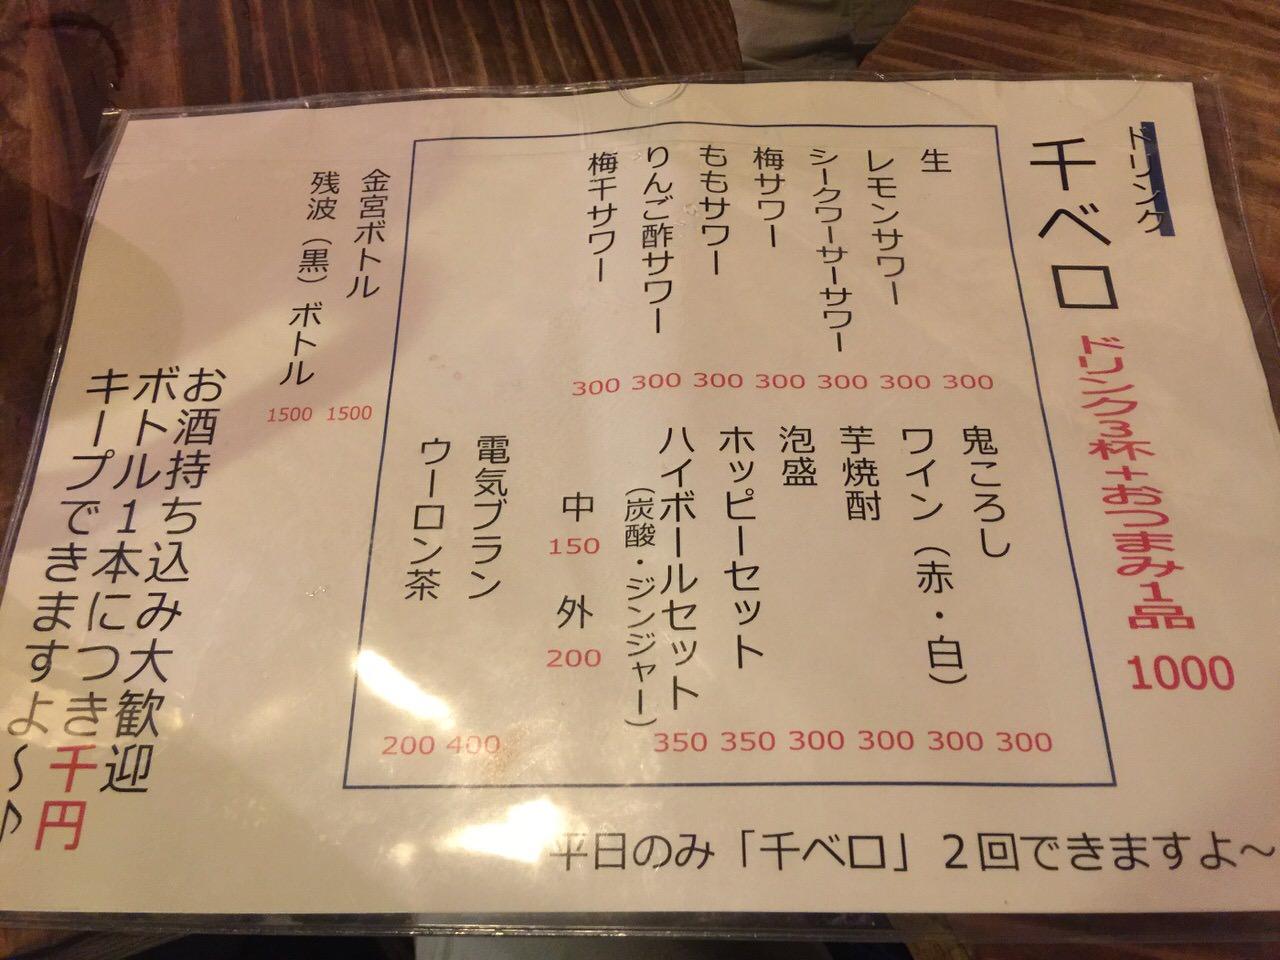 Adachiya naha 7663